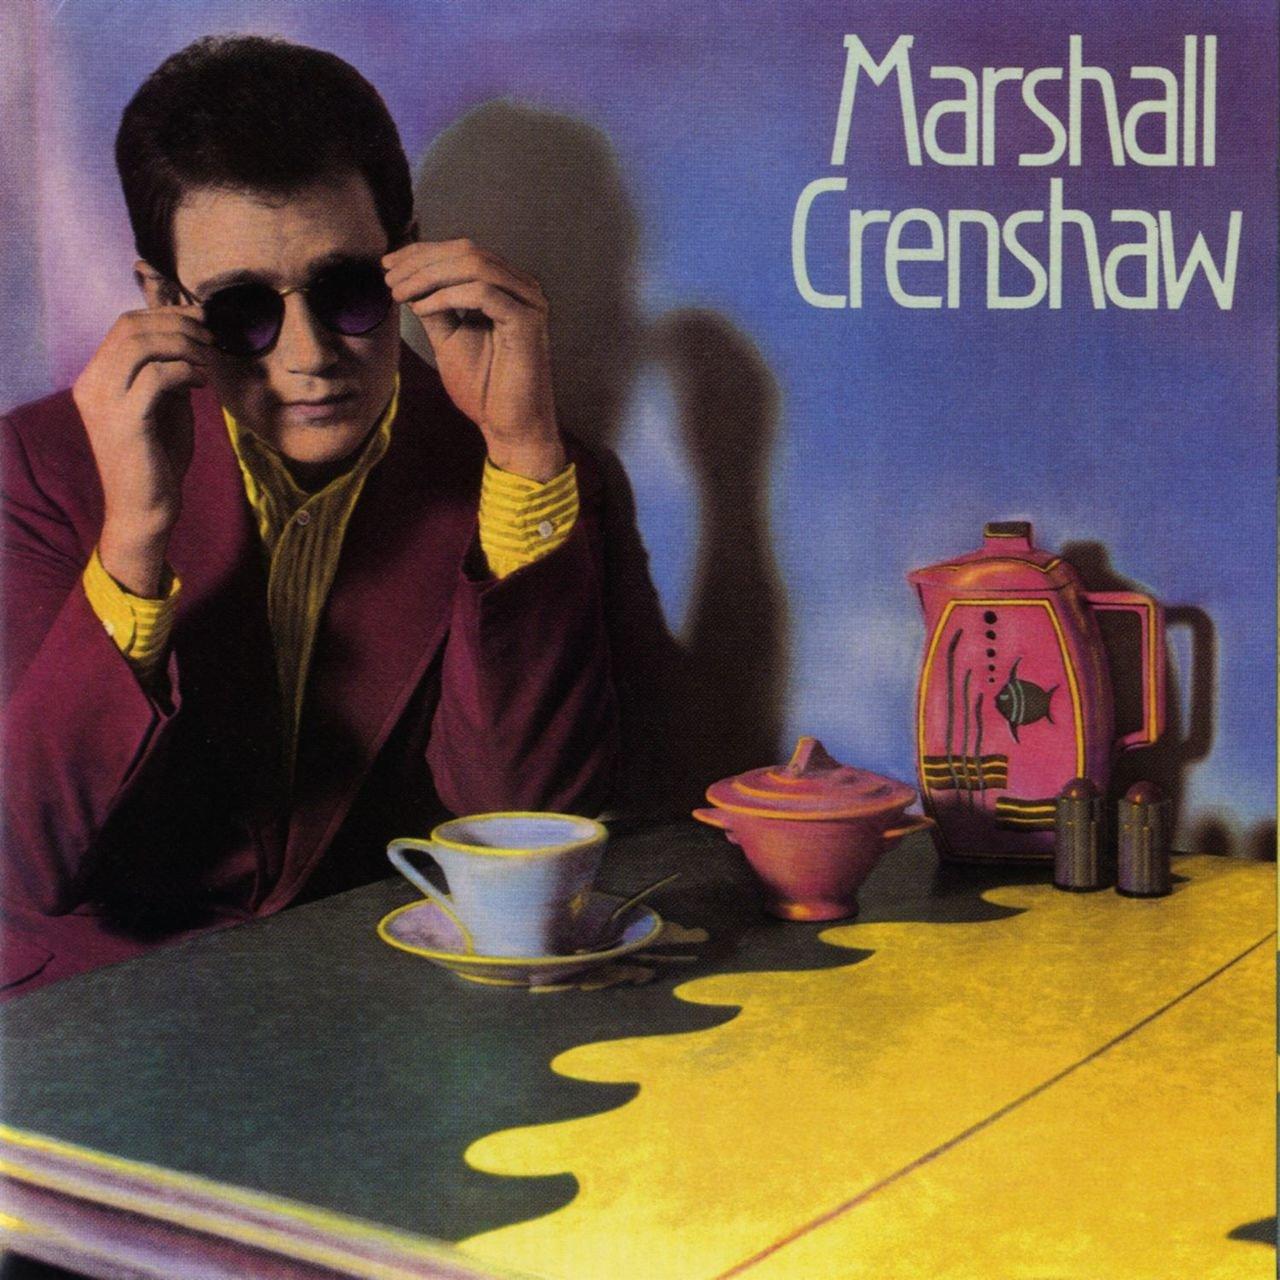 Marshall Crenshaw Debut Album